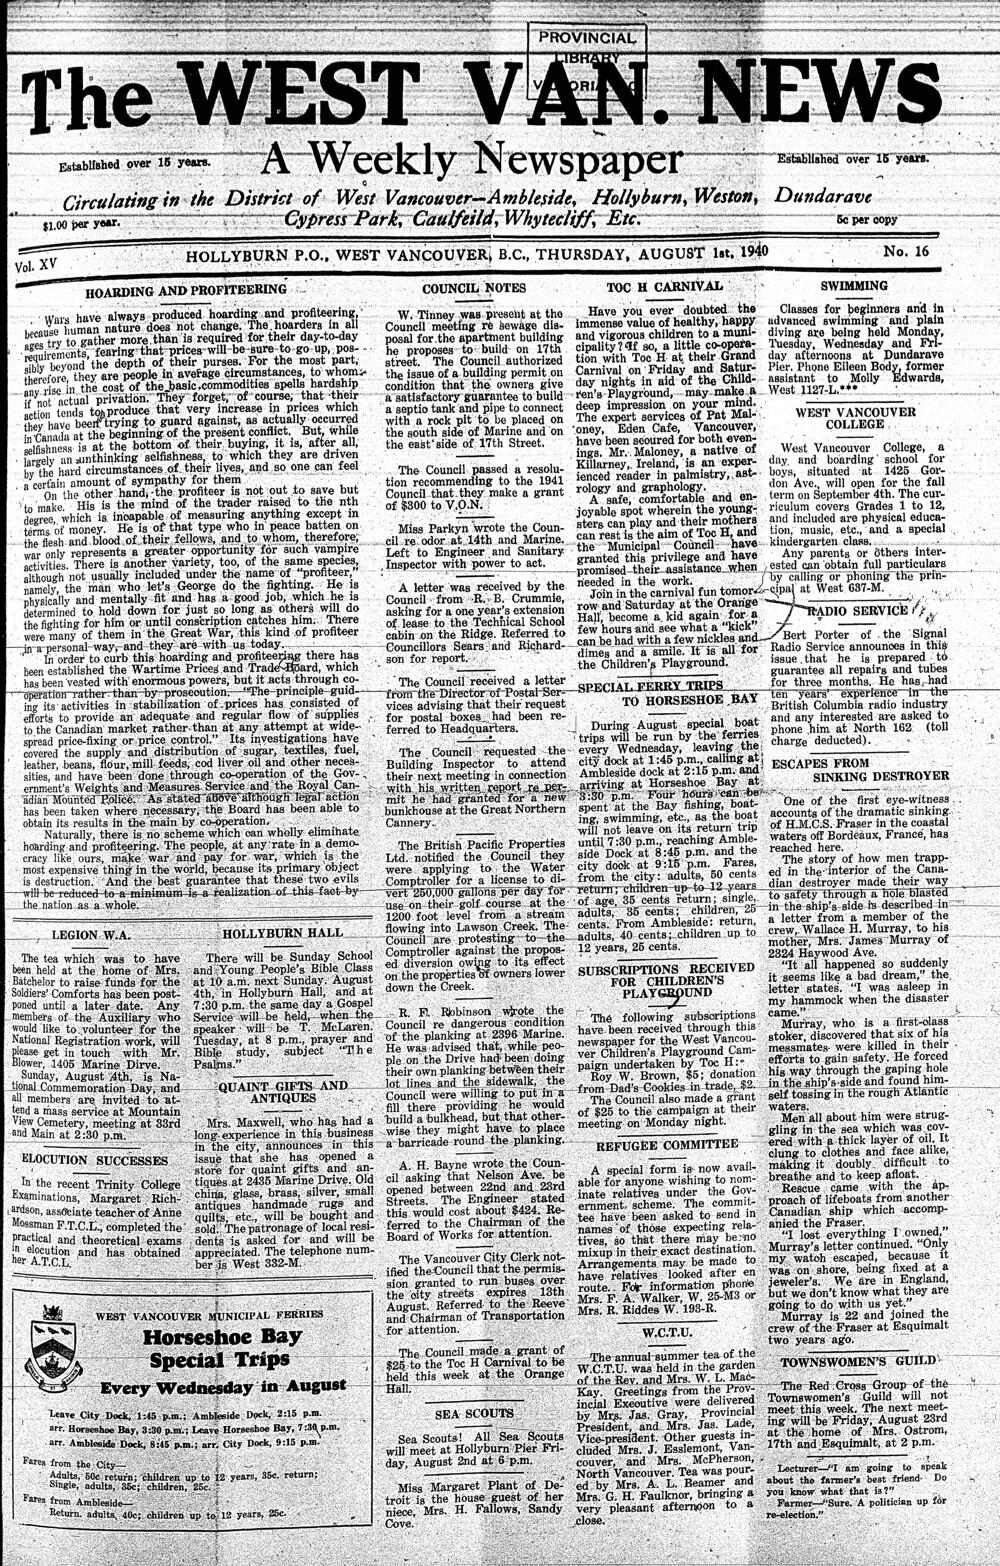 West Van. News (West Vancouver), 1 Aug 1940